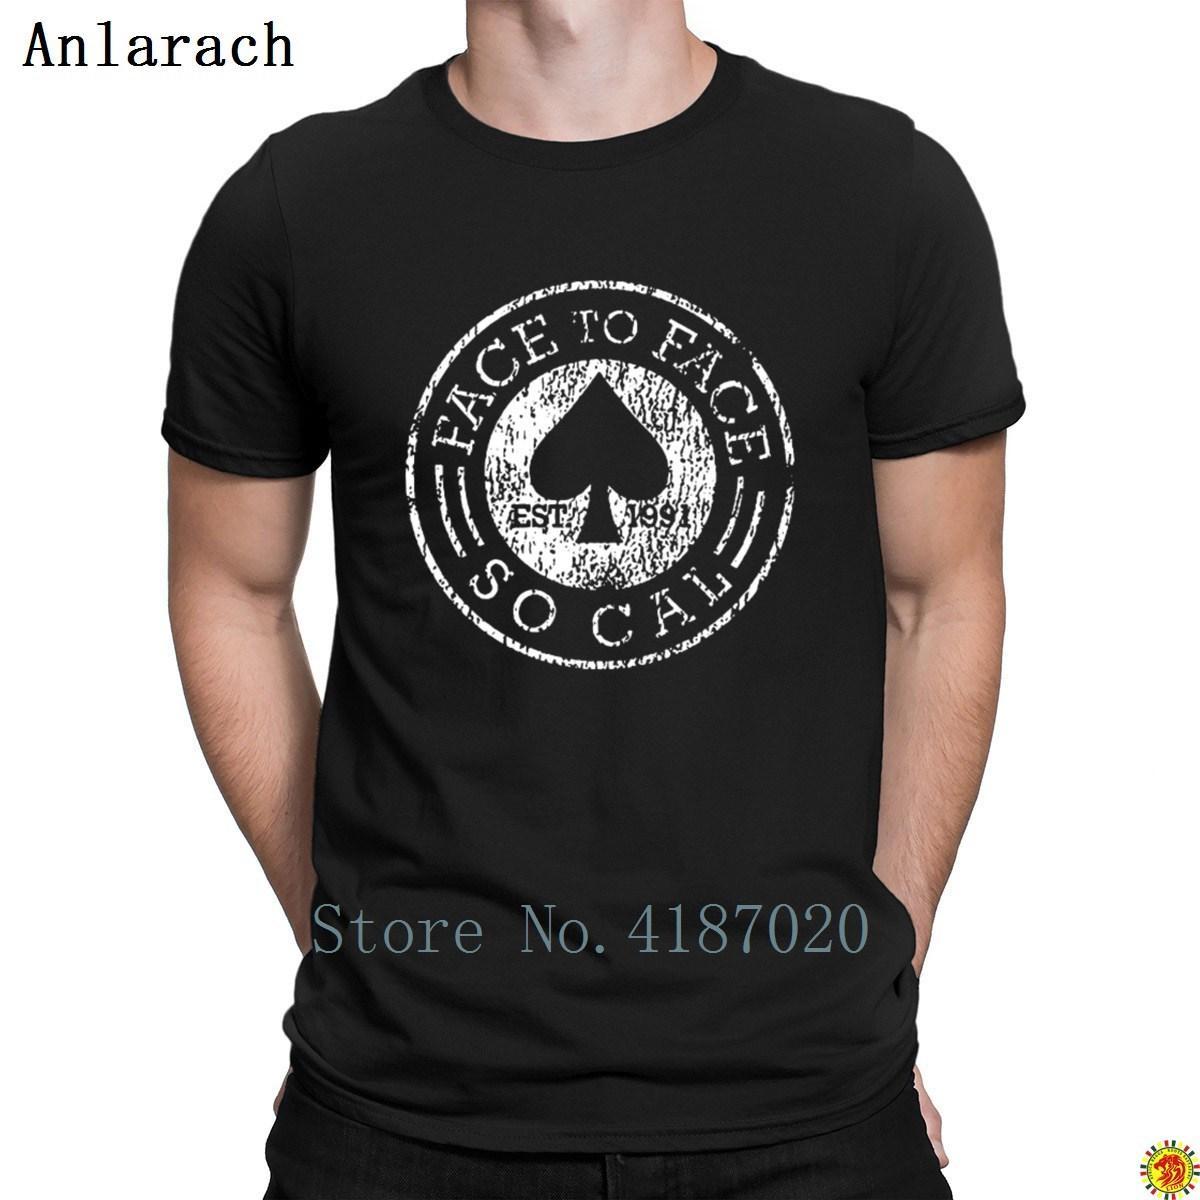 Cara a cara banda de punk rock camiseta del otoño del resorte interesante de manga corta camiseta de los hombres de Hip Hop Personalizar Natural Slim Fit